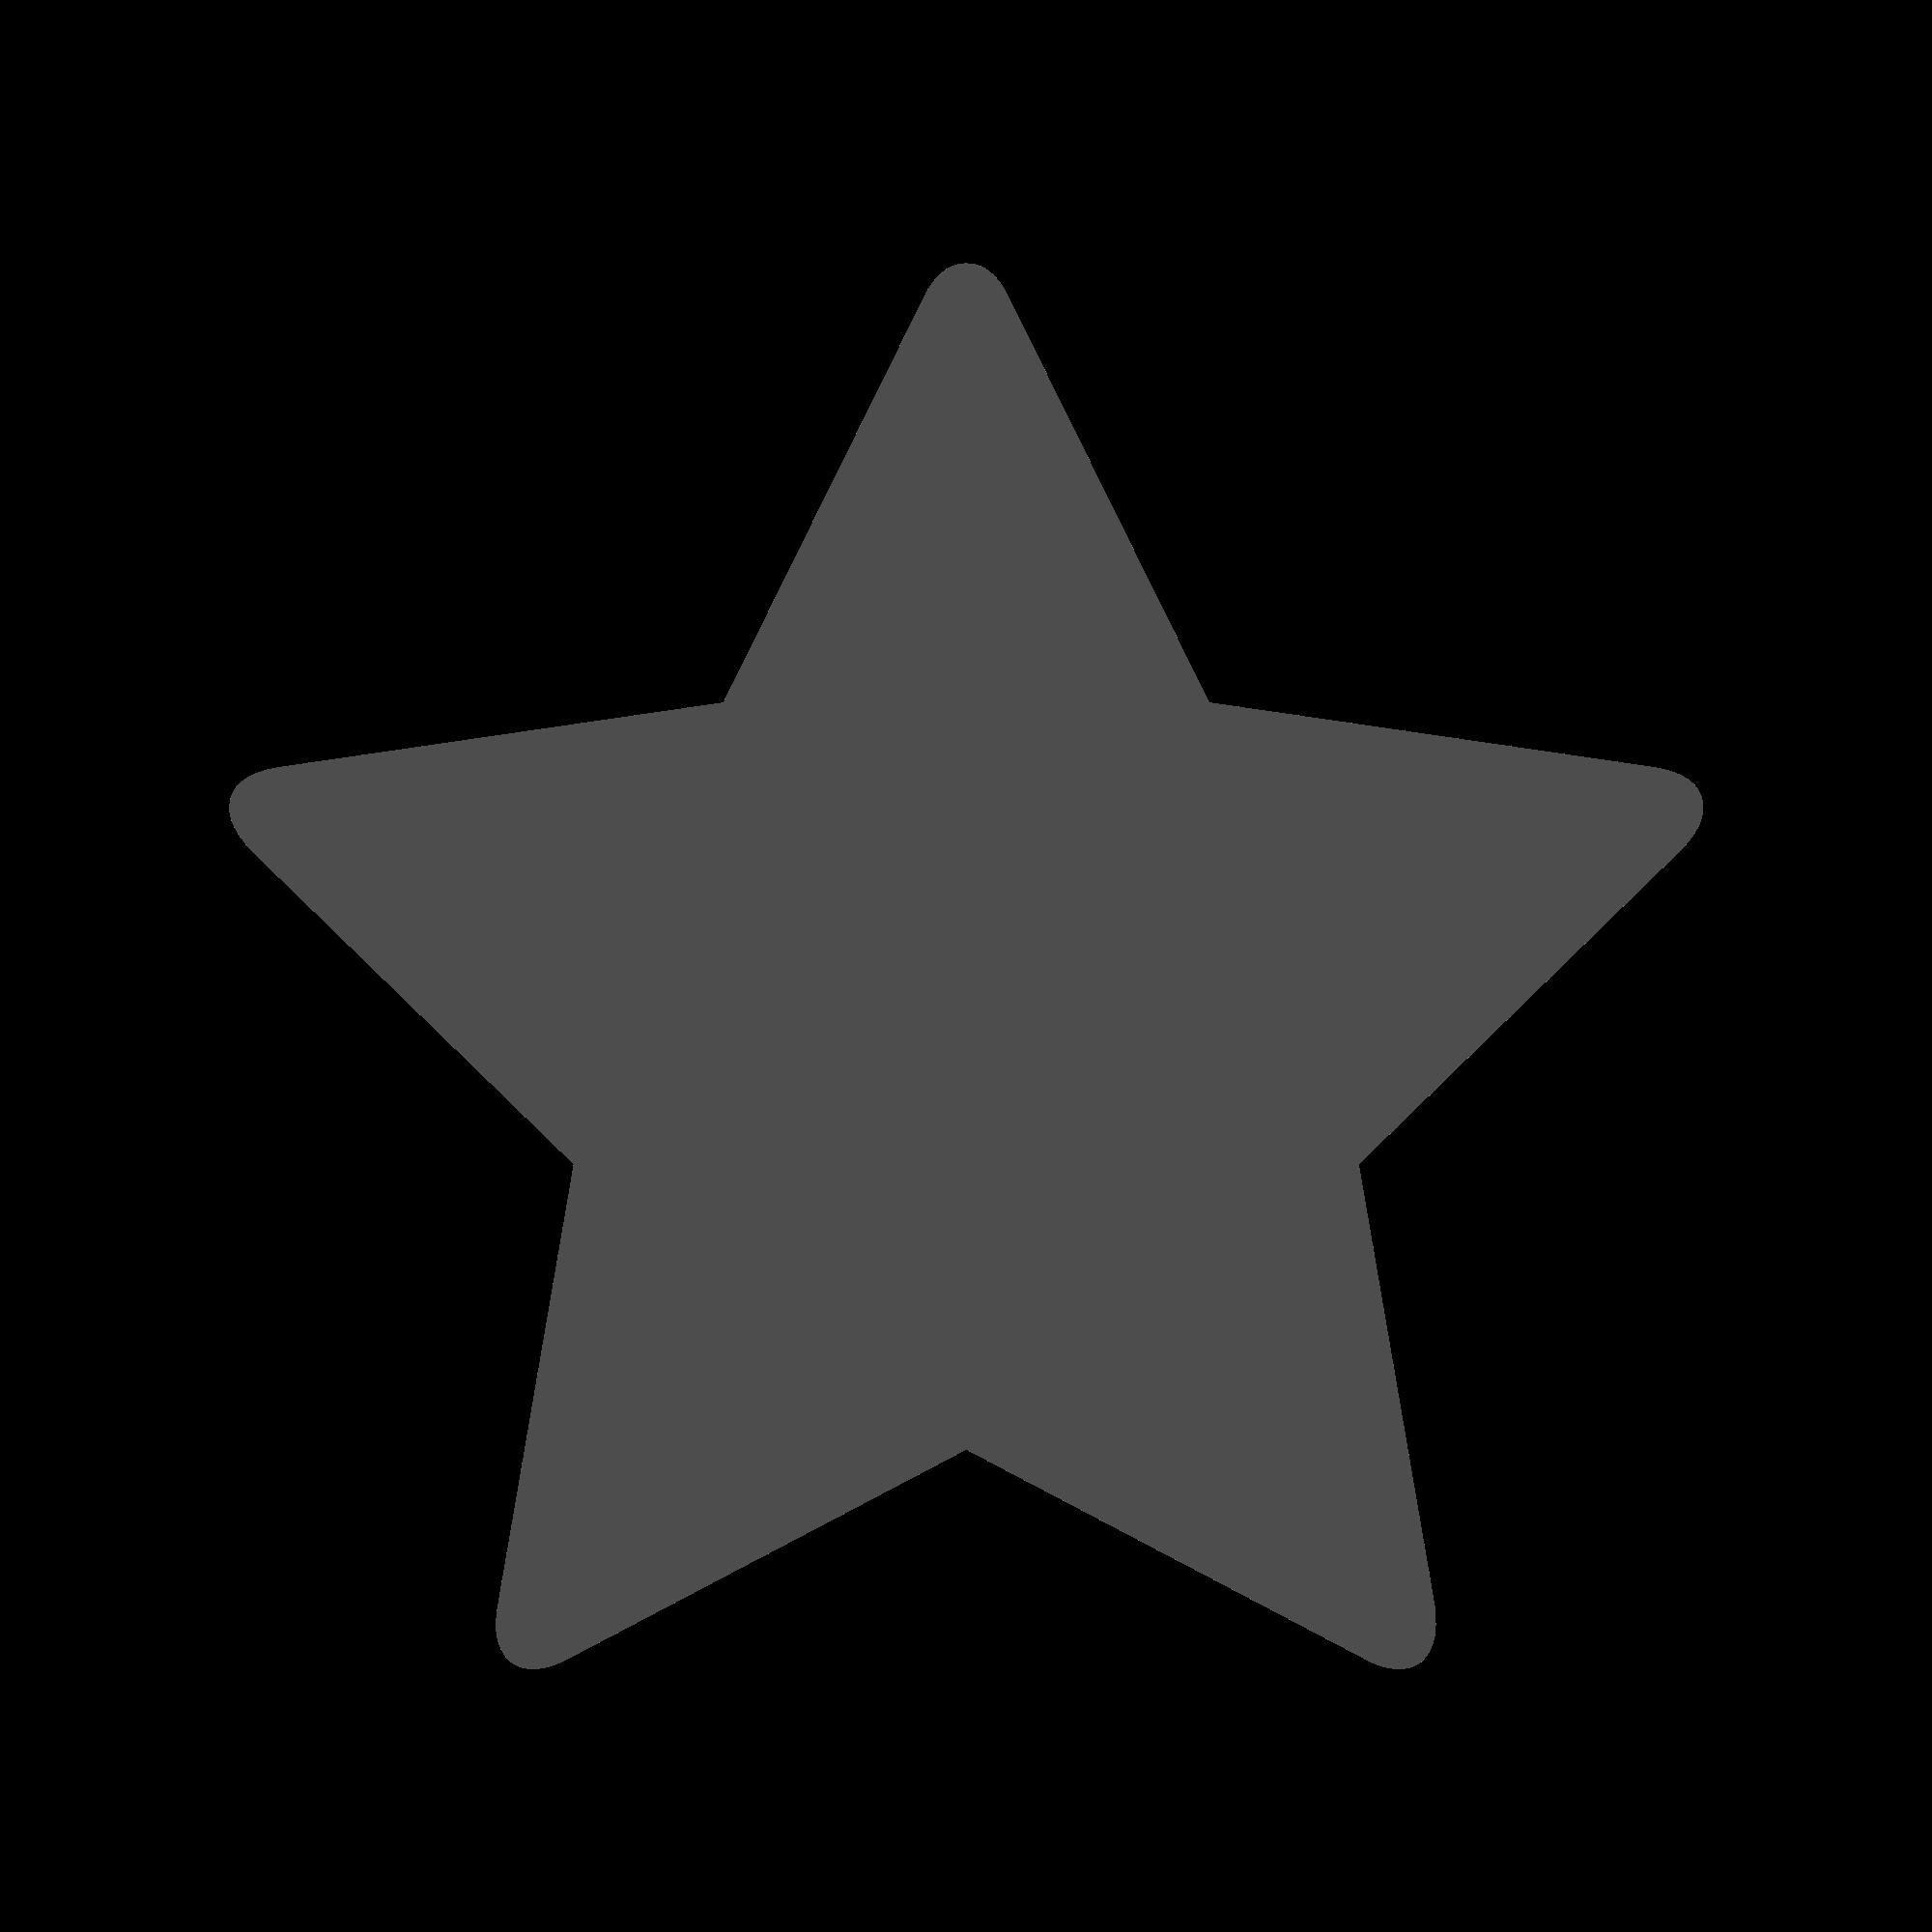 Stars vector png. File antu draw polygon